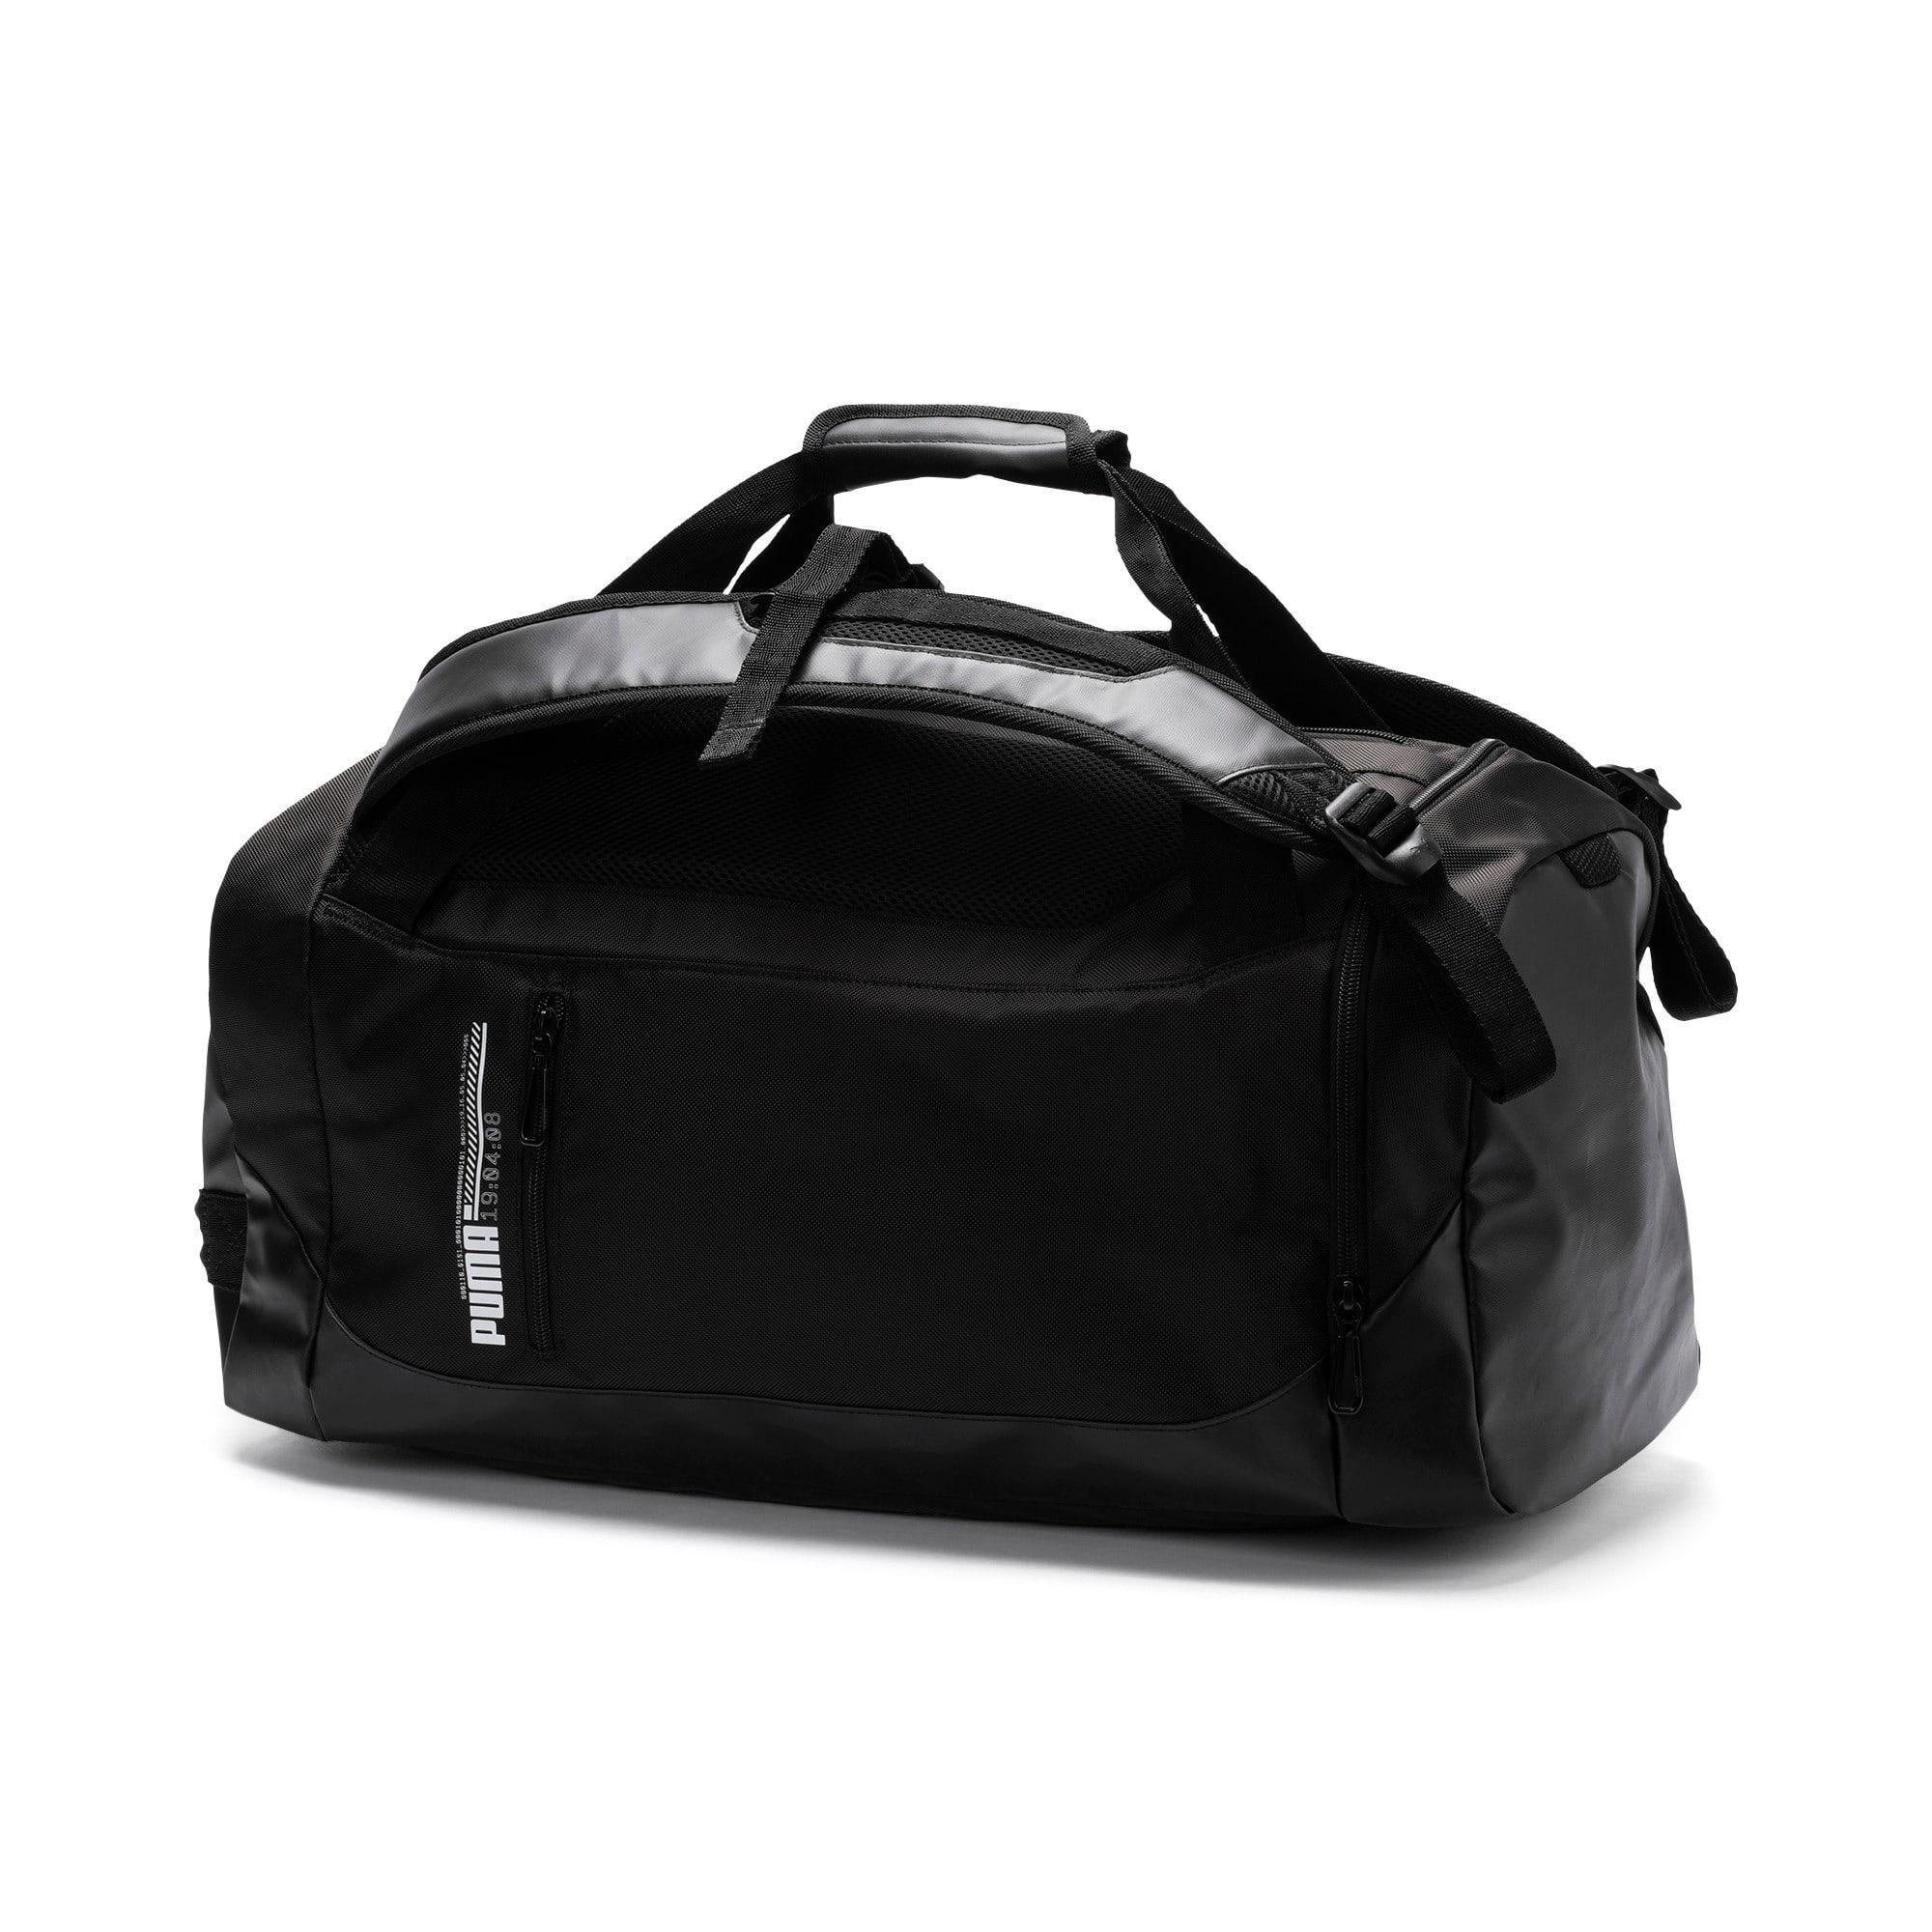 Thumbnail 1 of Energy Two-Way Duffel Bag, Puma Black, medium-IND